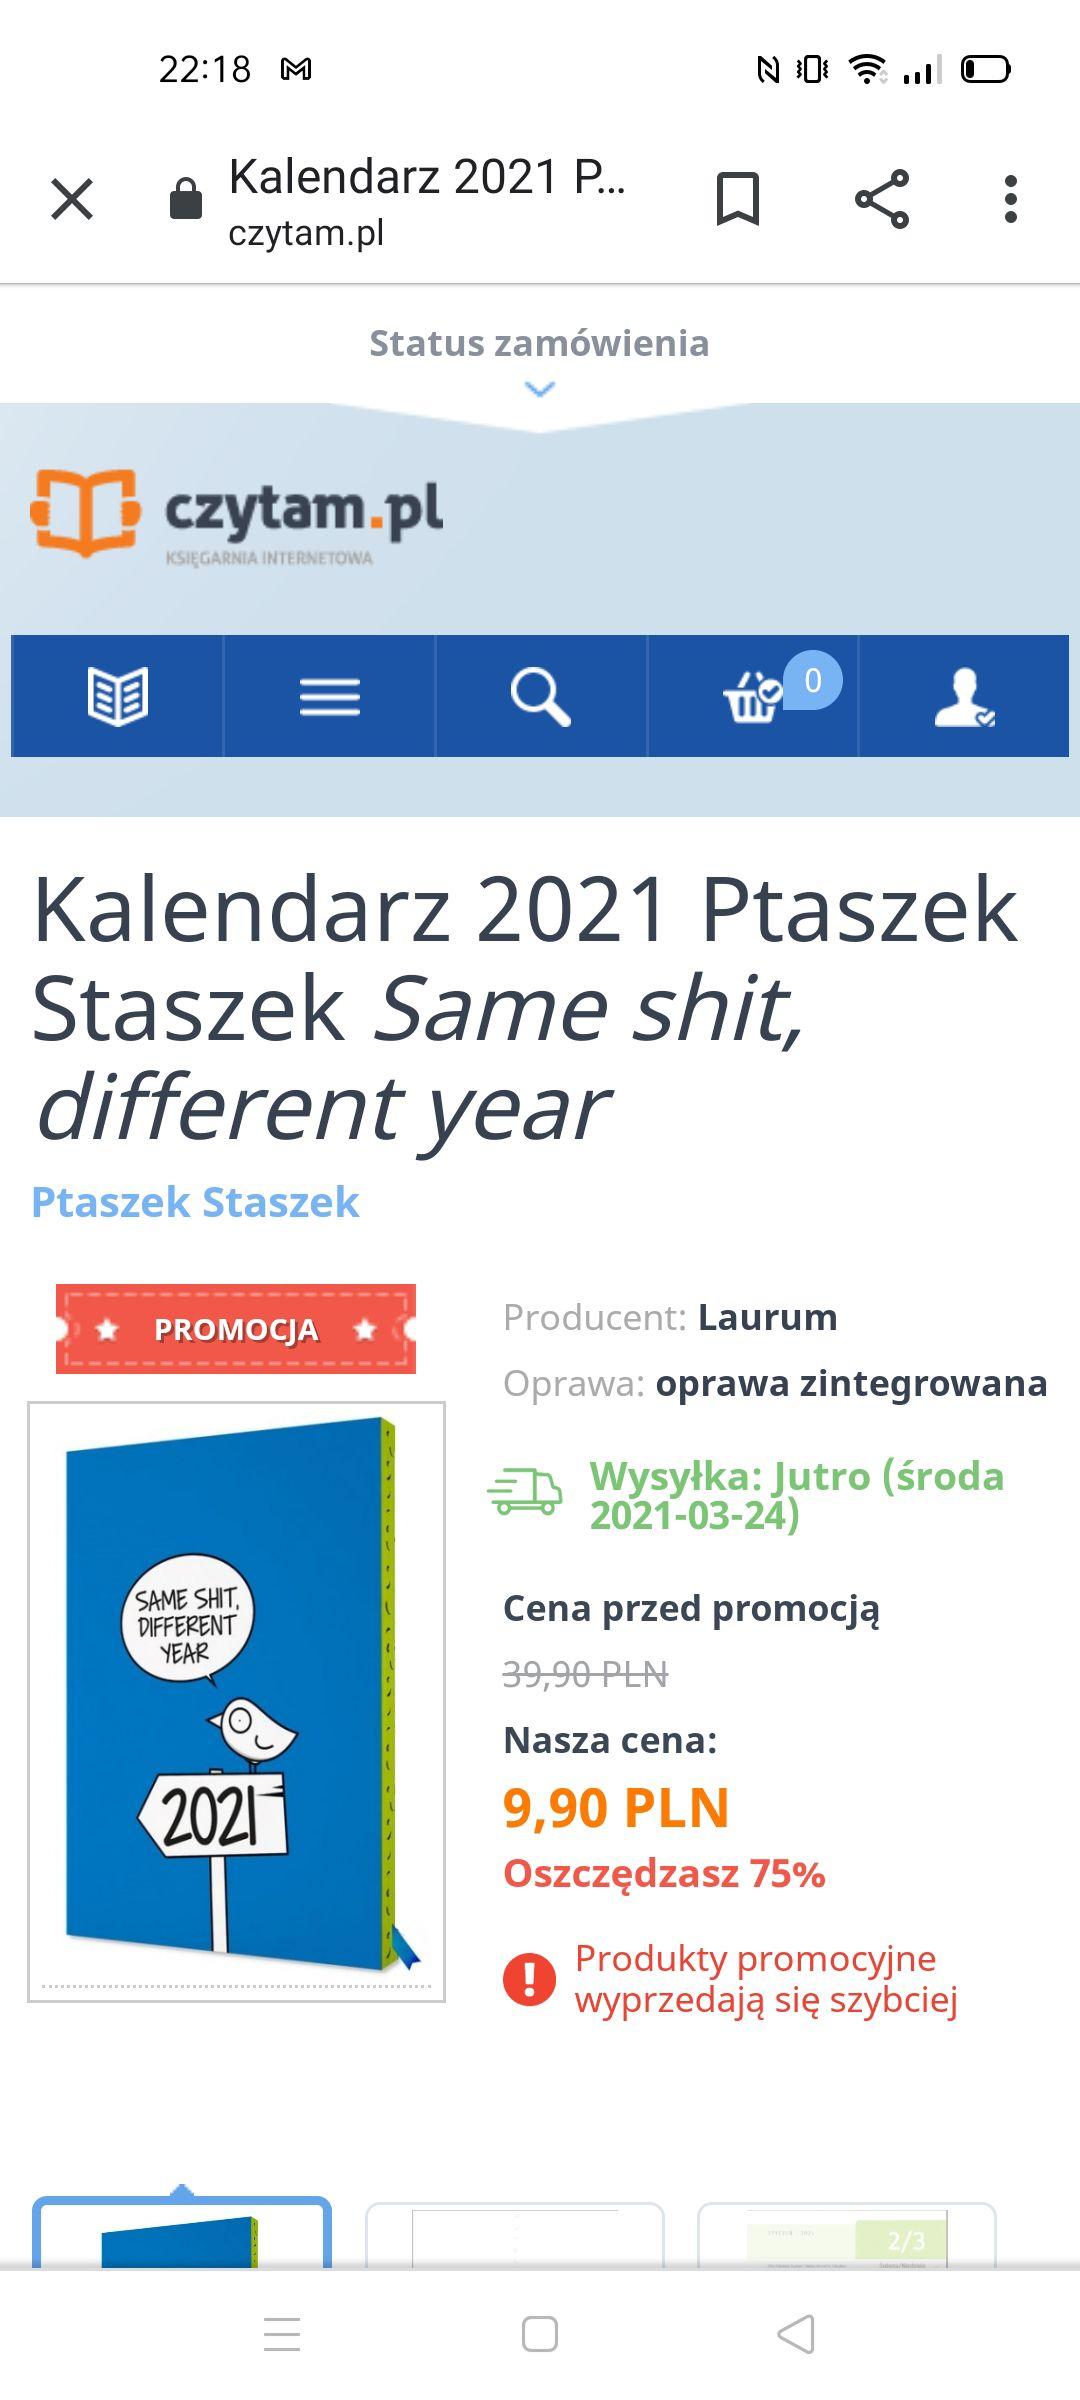 Kalendarz 2021 Ptaszek StaszekSame shit, different year